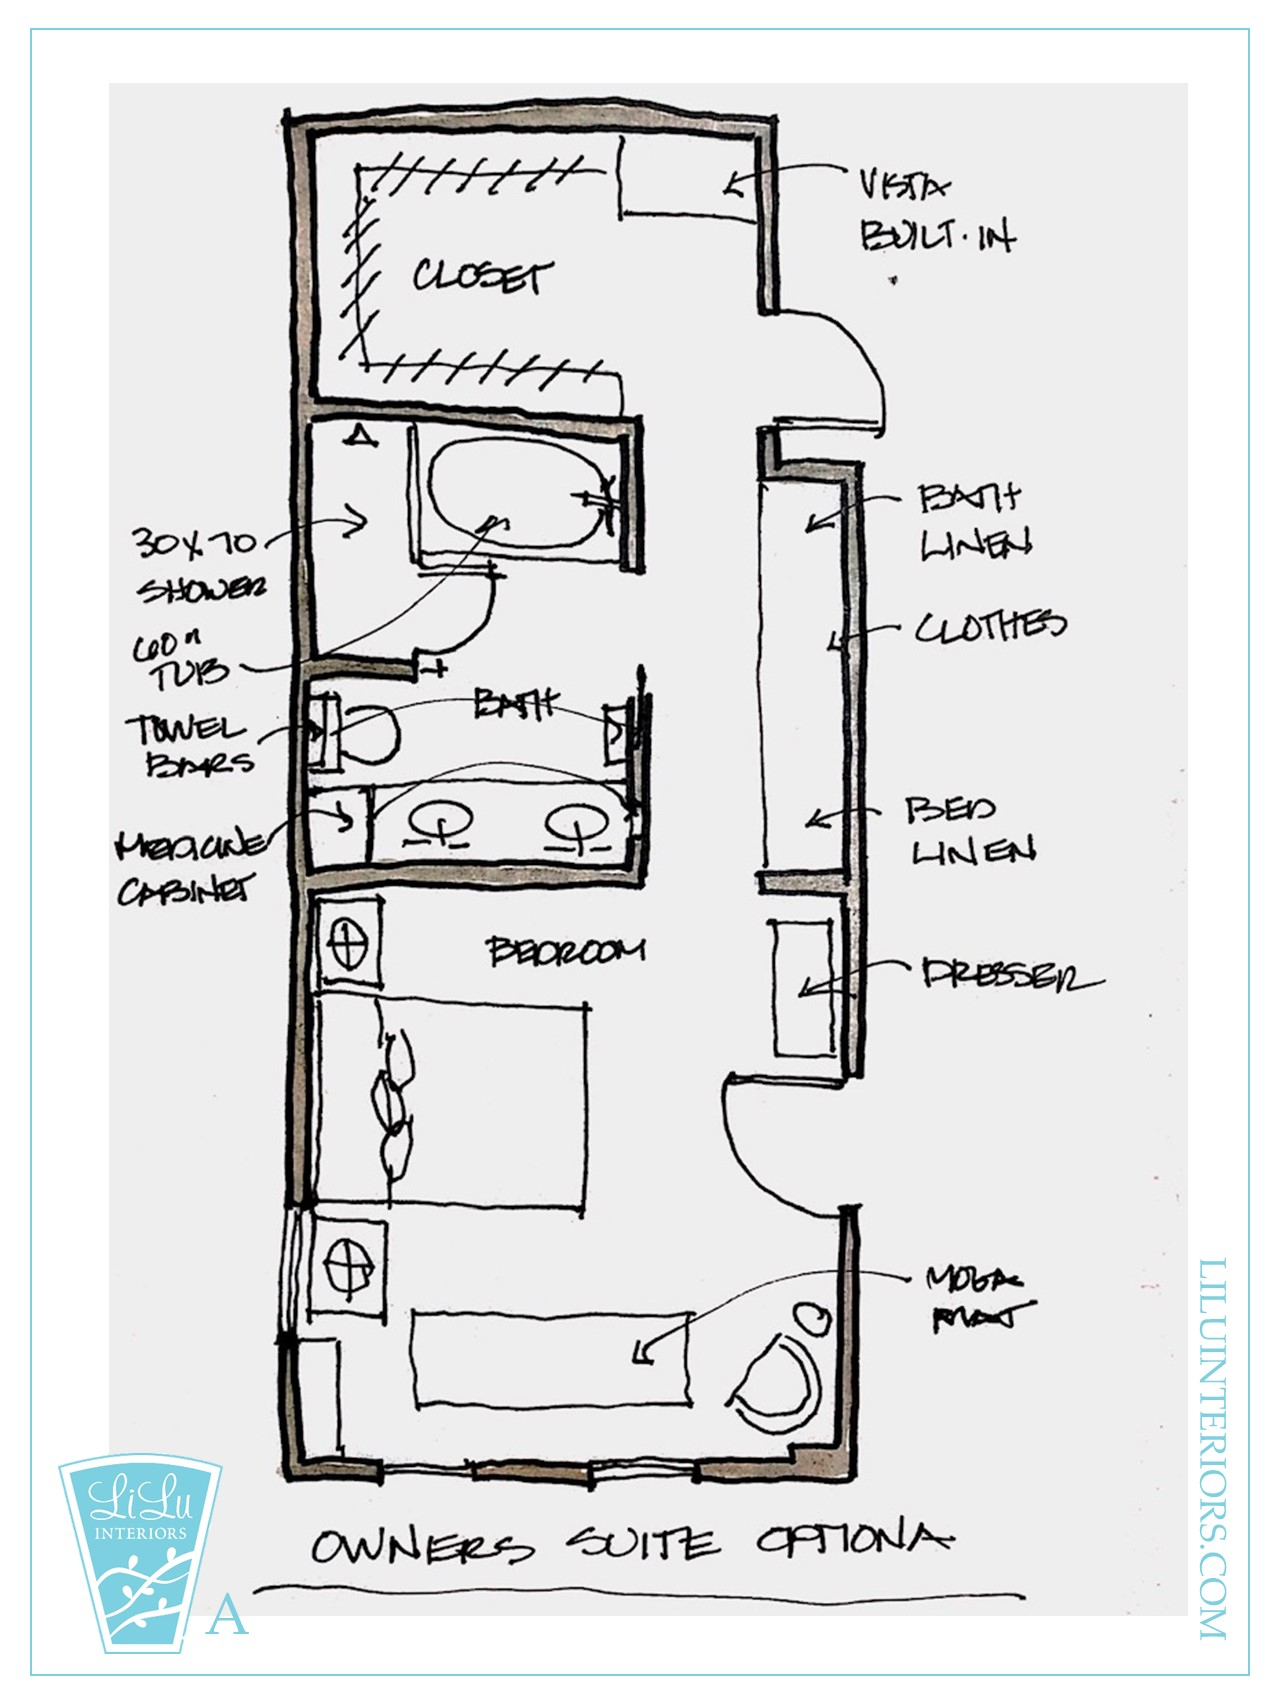 master-suite-transformation-interior-design-mpls-55405.jpeg